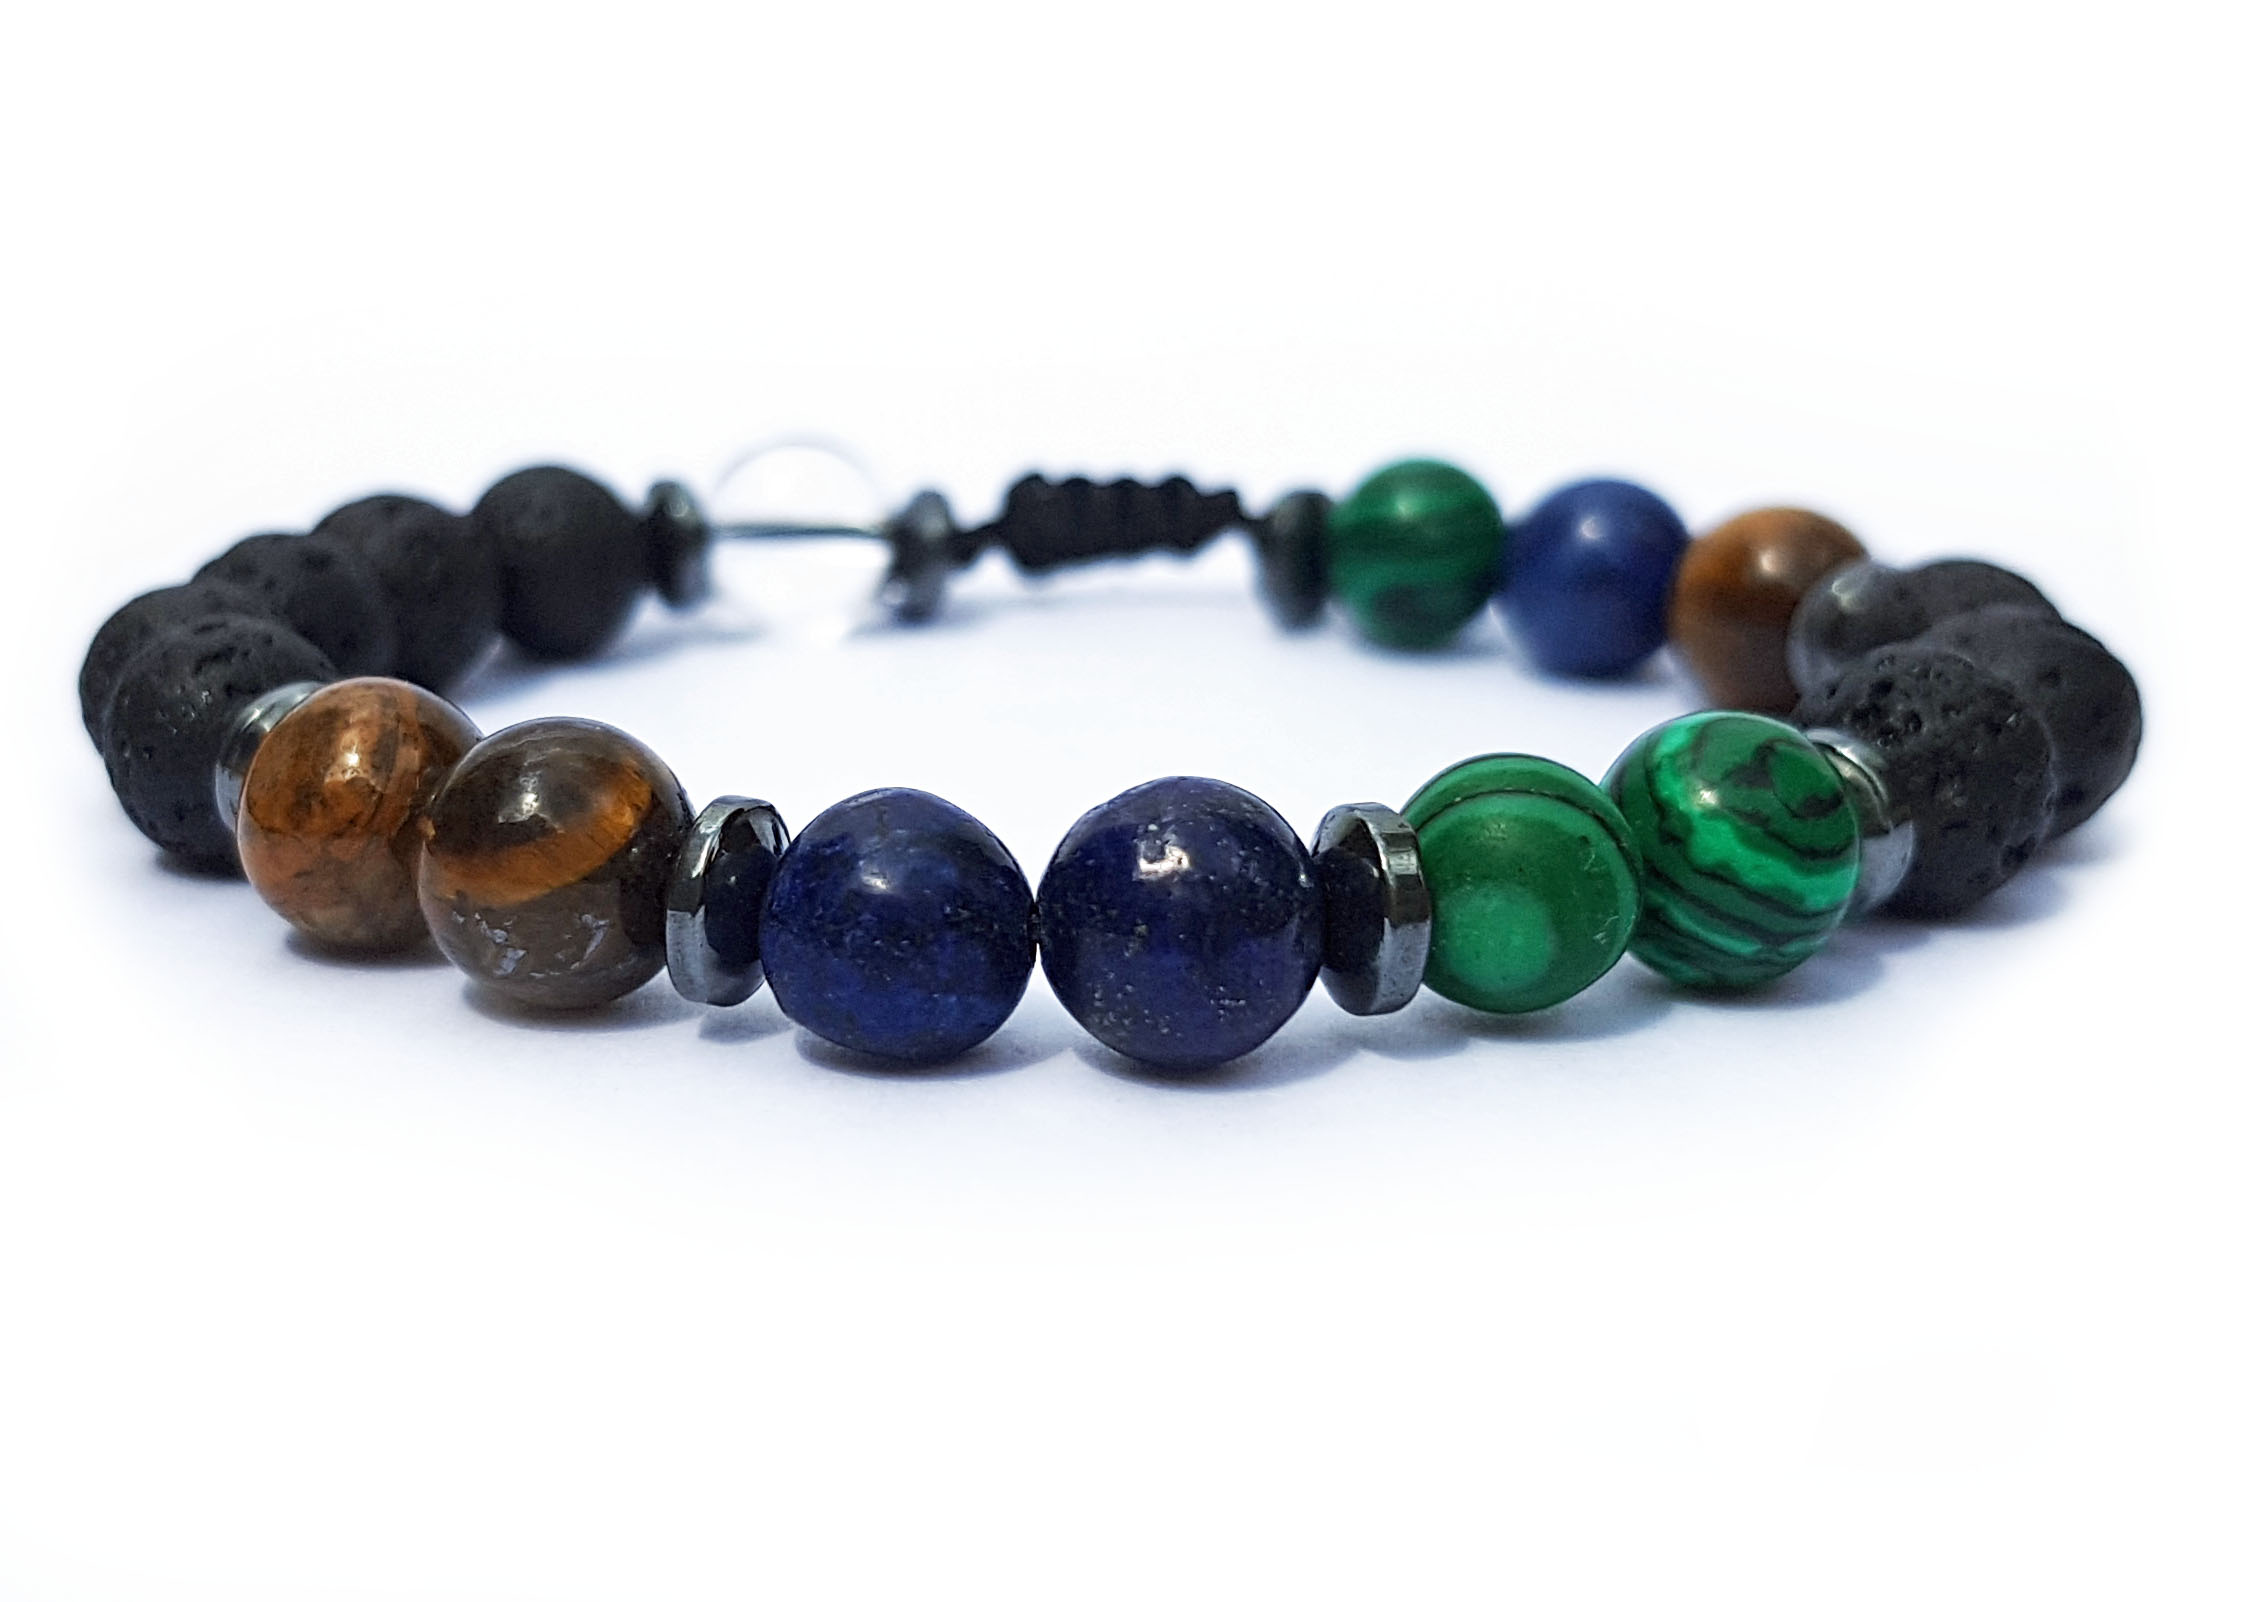 Levně Náramek z minerálů pro Býka - tygří oko, malachit a lapis lazuli